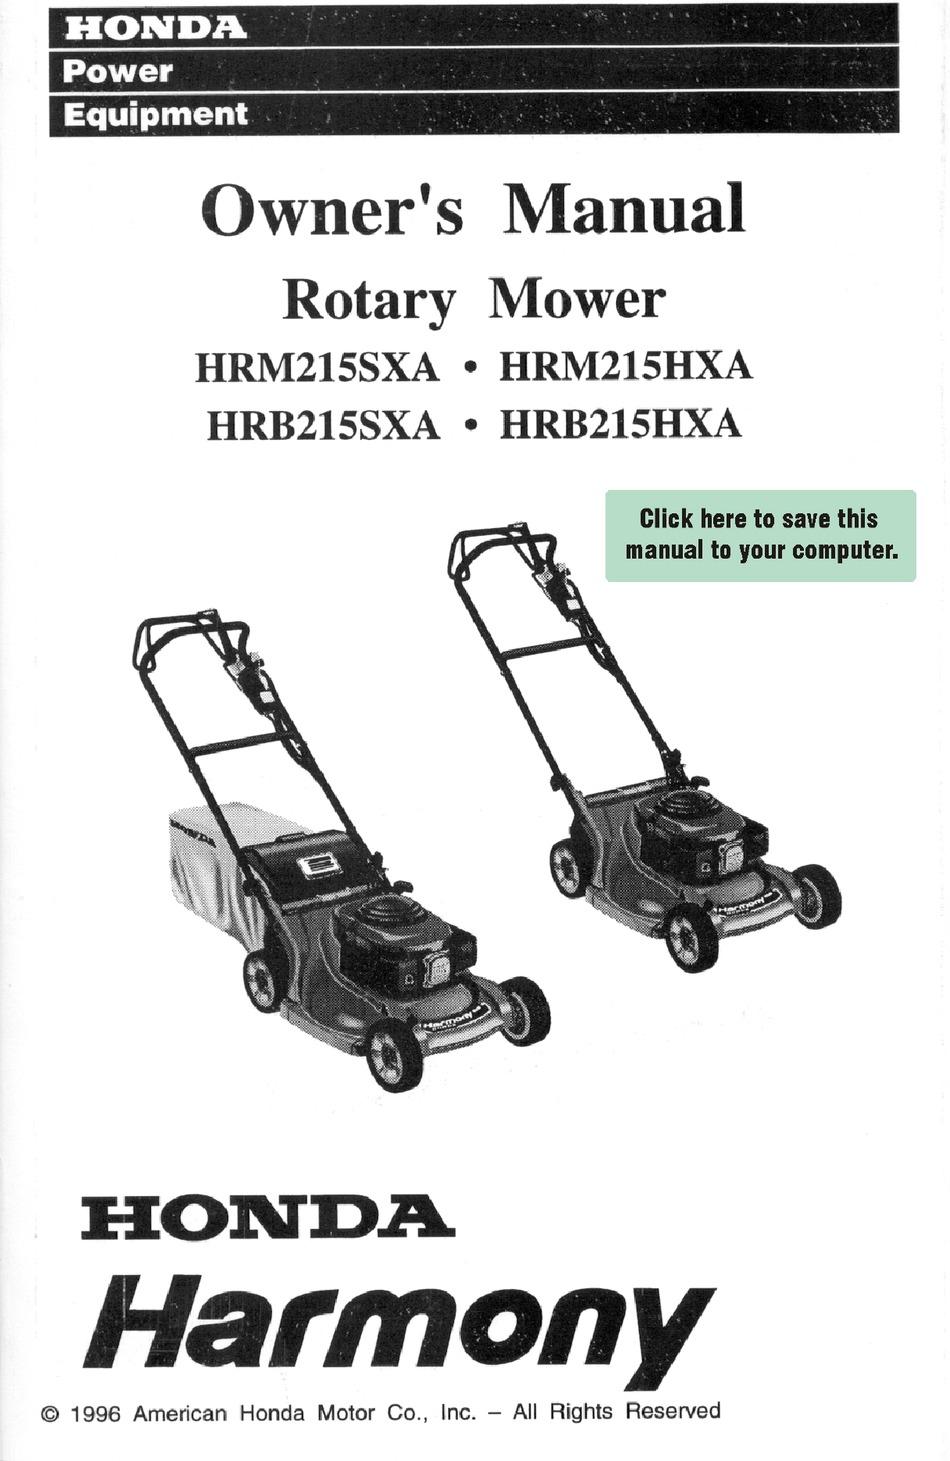 HONDA HARMONY HRM215SXA OWNER'S MANUAL Pdf Download